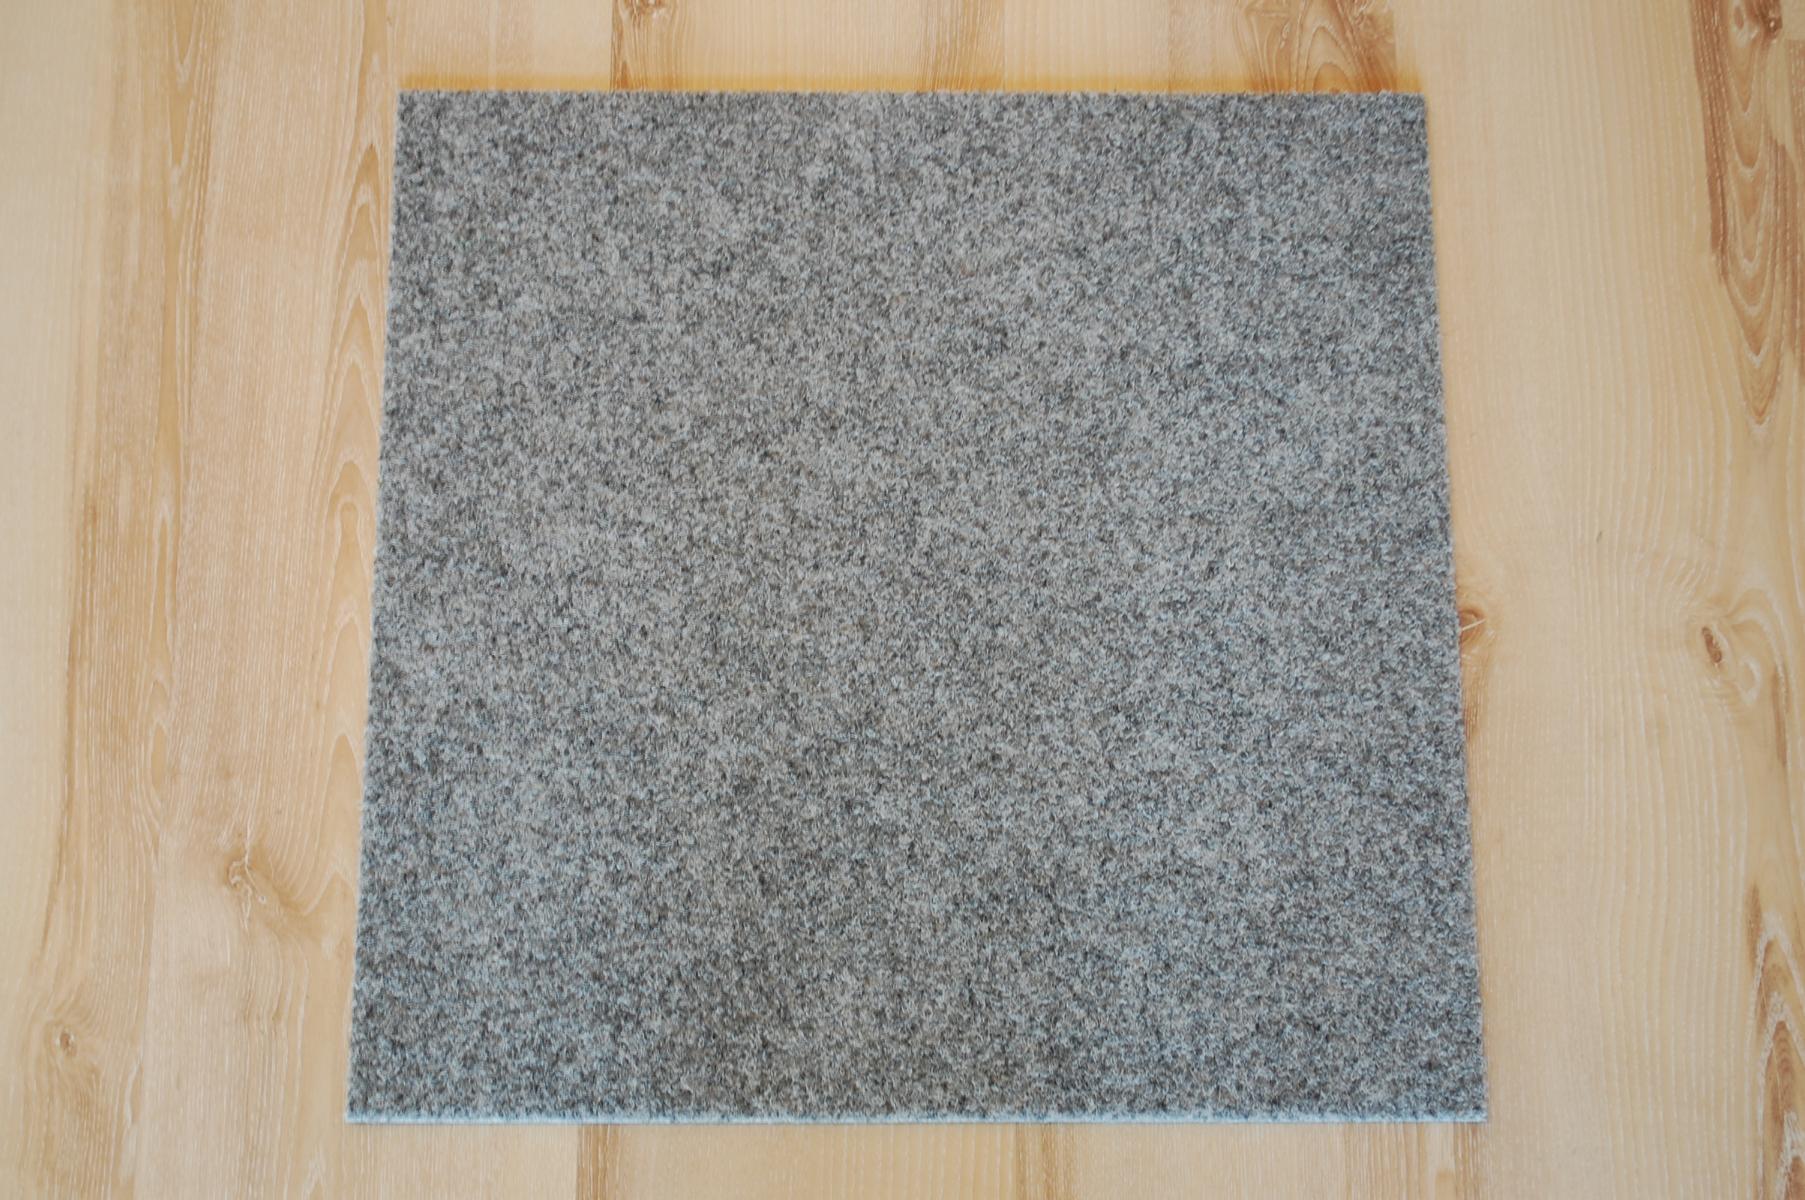 Tappeto piastrelle vox cm b balta grigio chiaro grigio